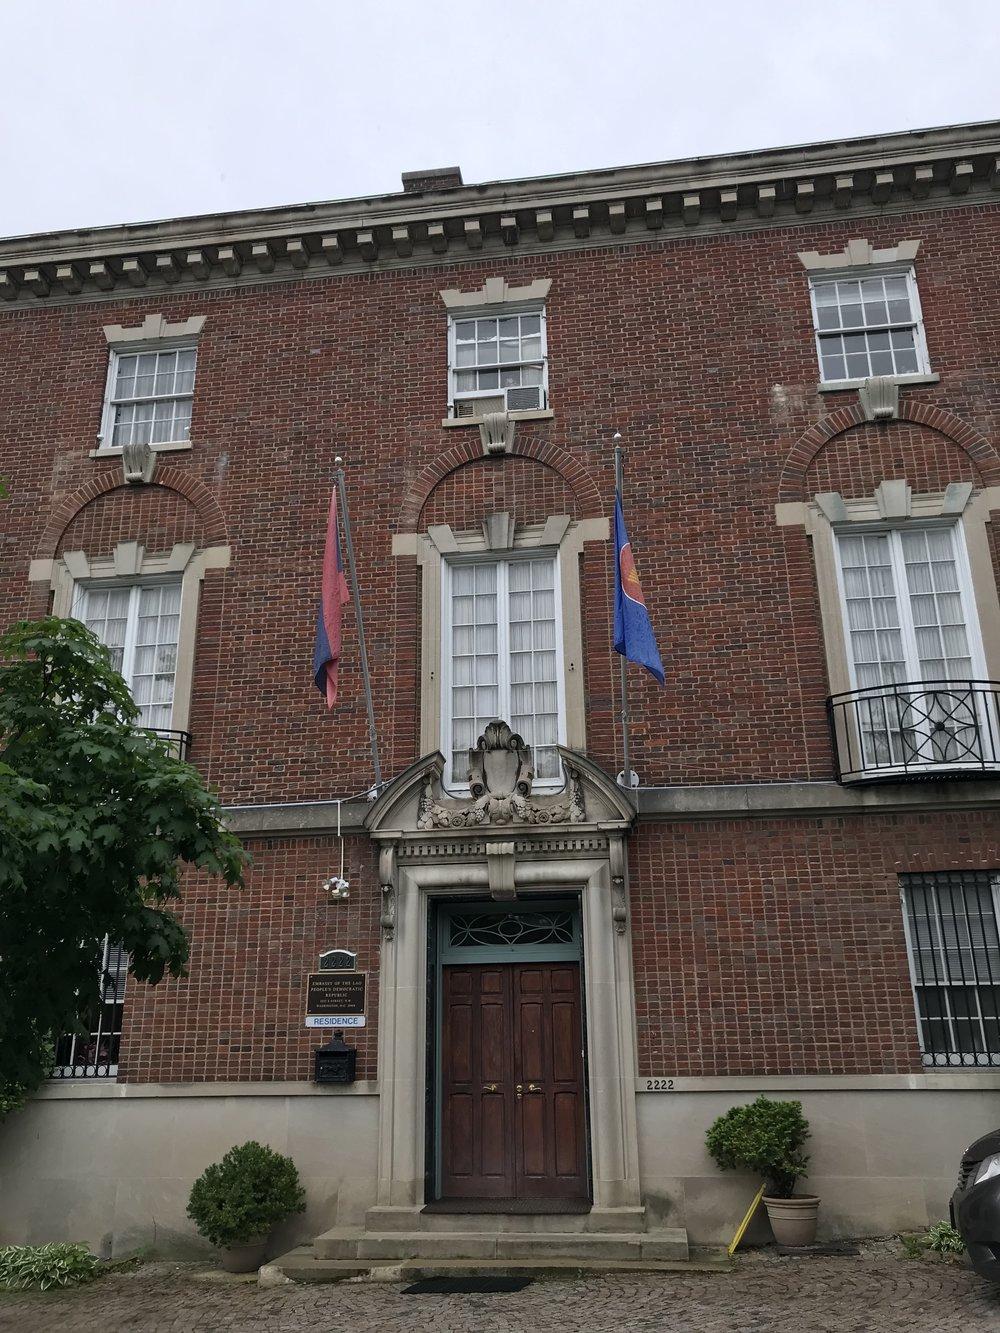 The Embassy of Laos.